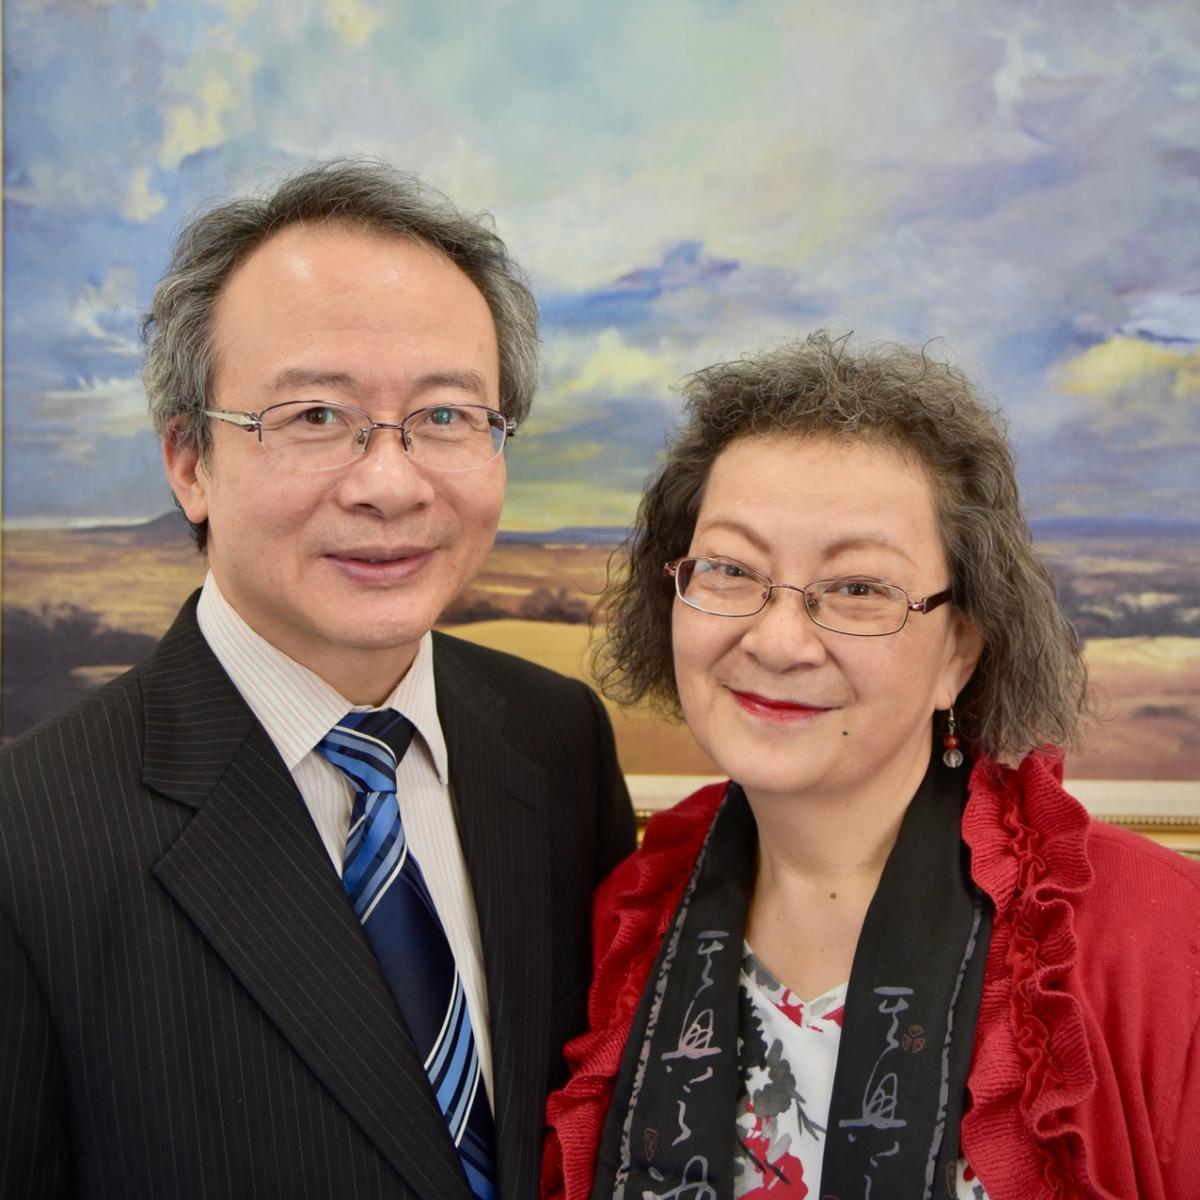 interview_family_chen1.jpg